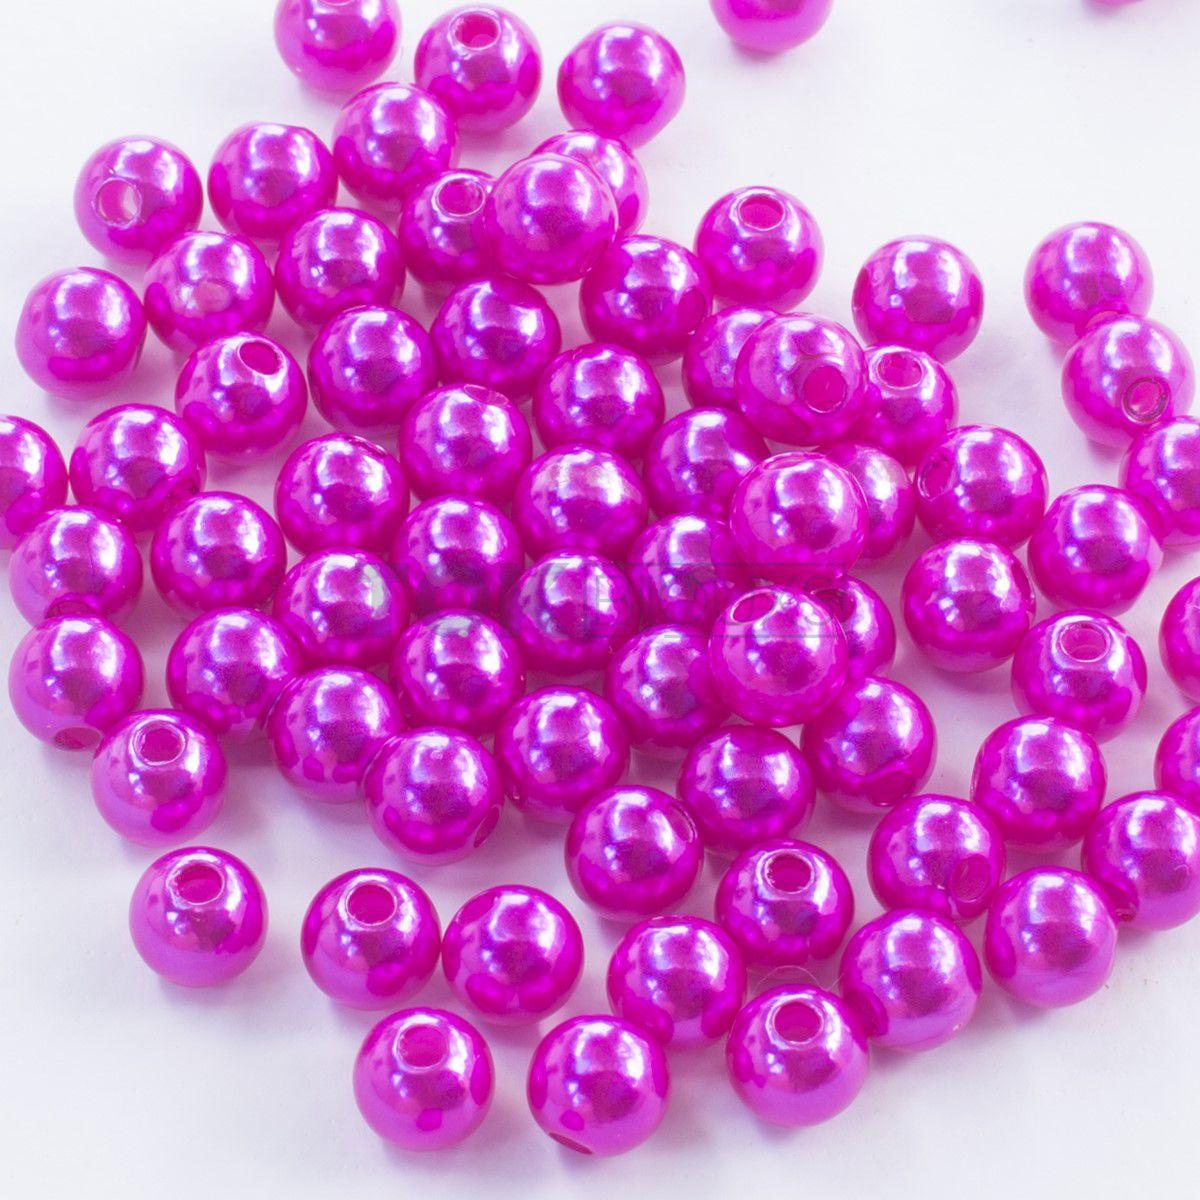 Pérola Redonda Abs  3mm - Pink - 25g